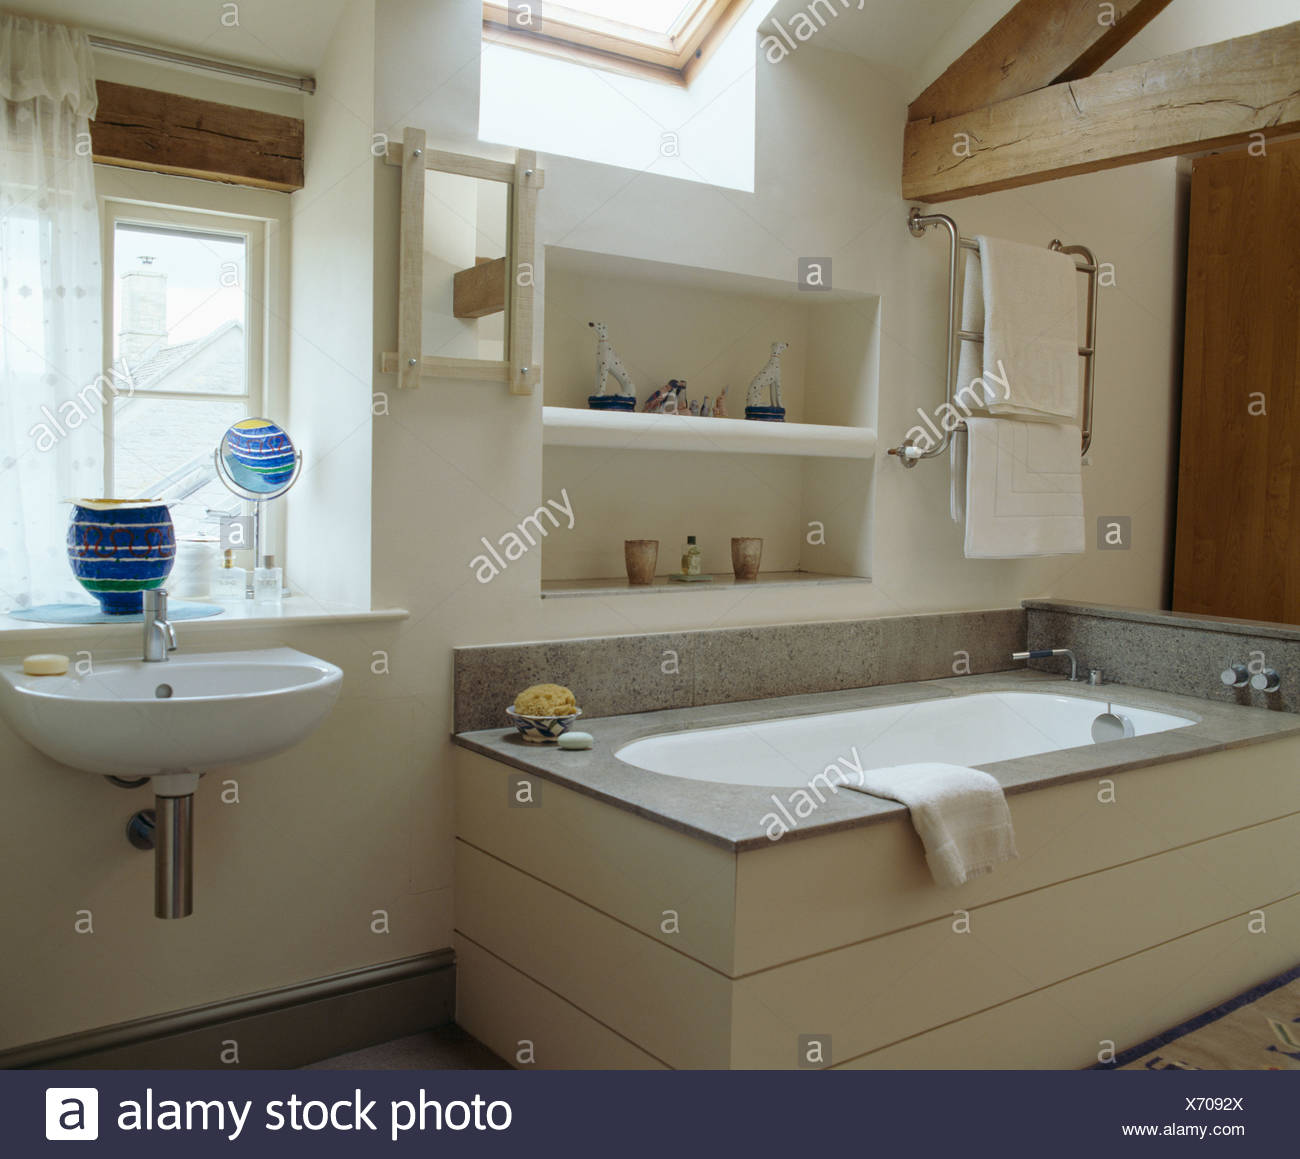 Alcove Shelving Above Bath With Granite Edging In Modern White Barn  Conversion Bathroom